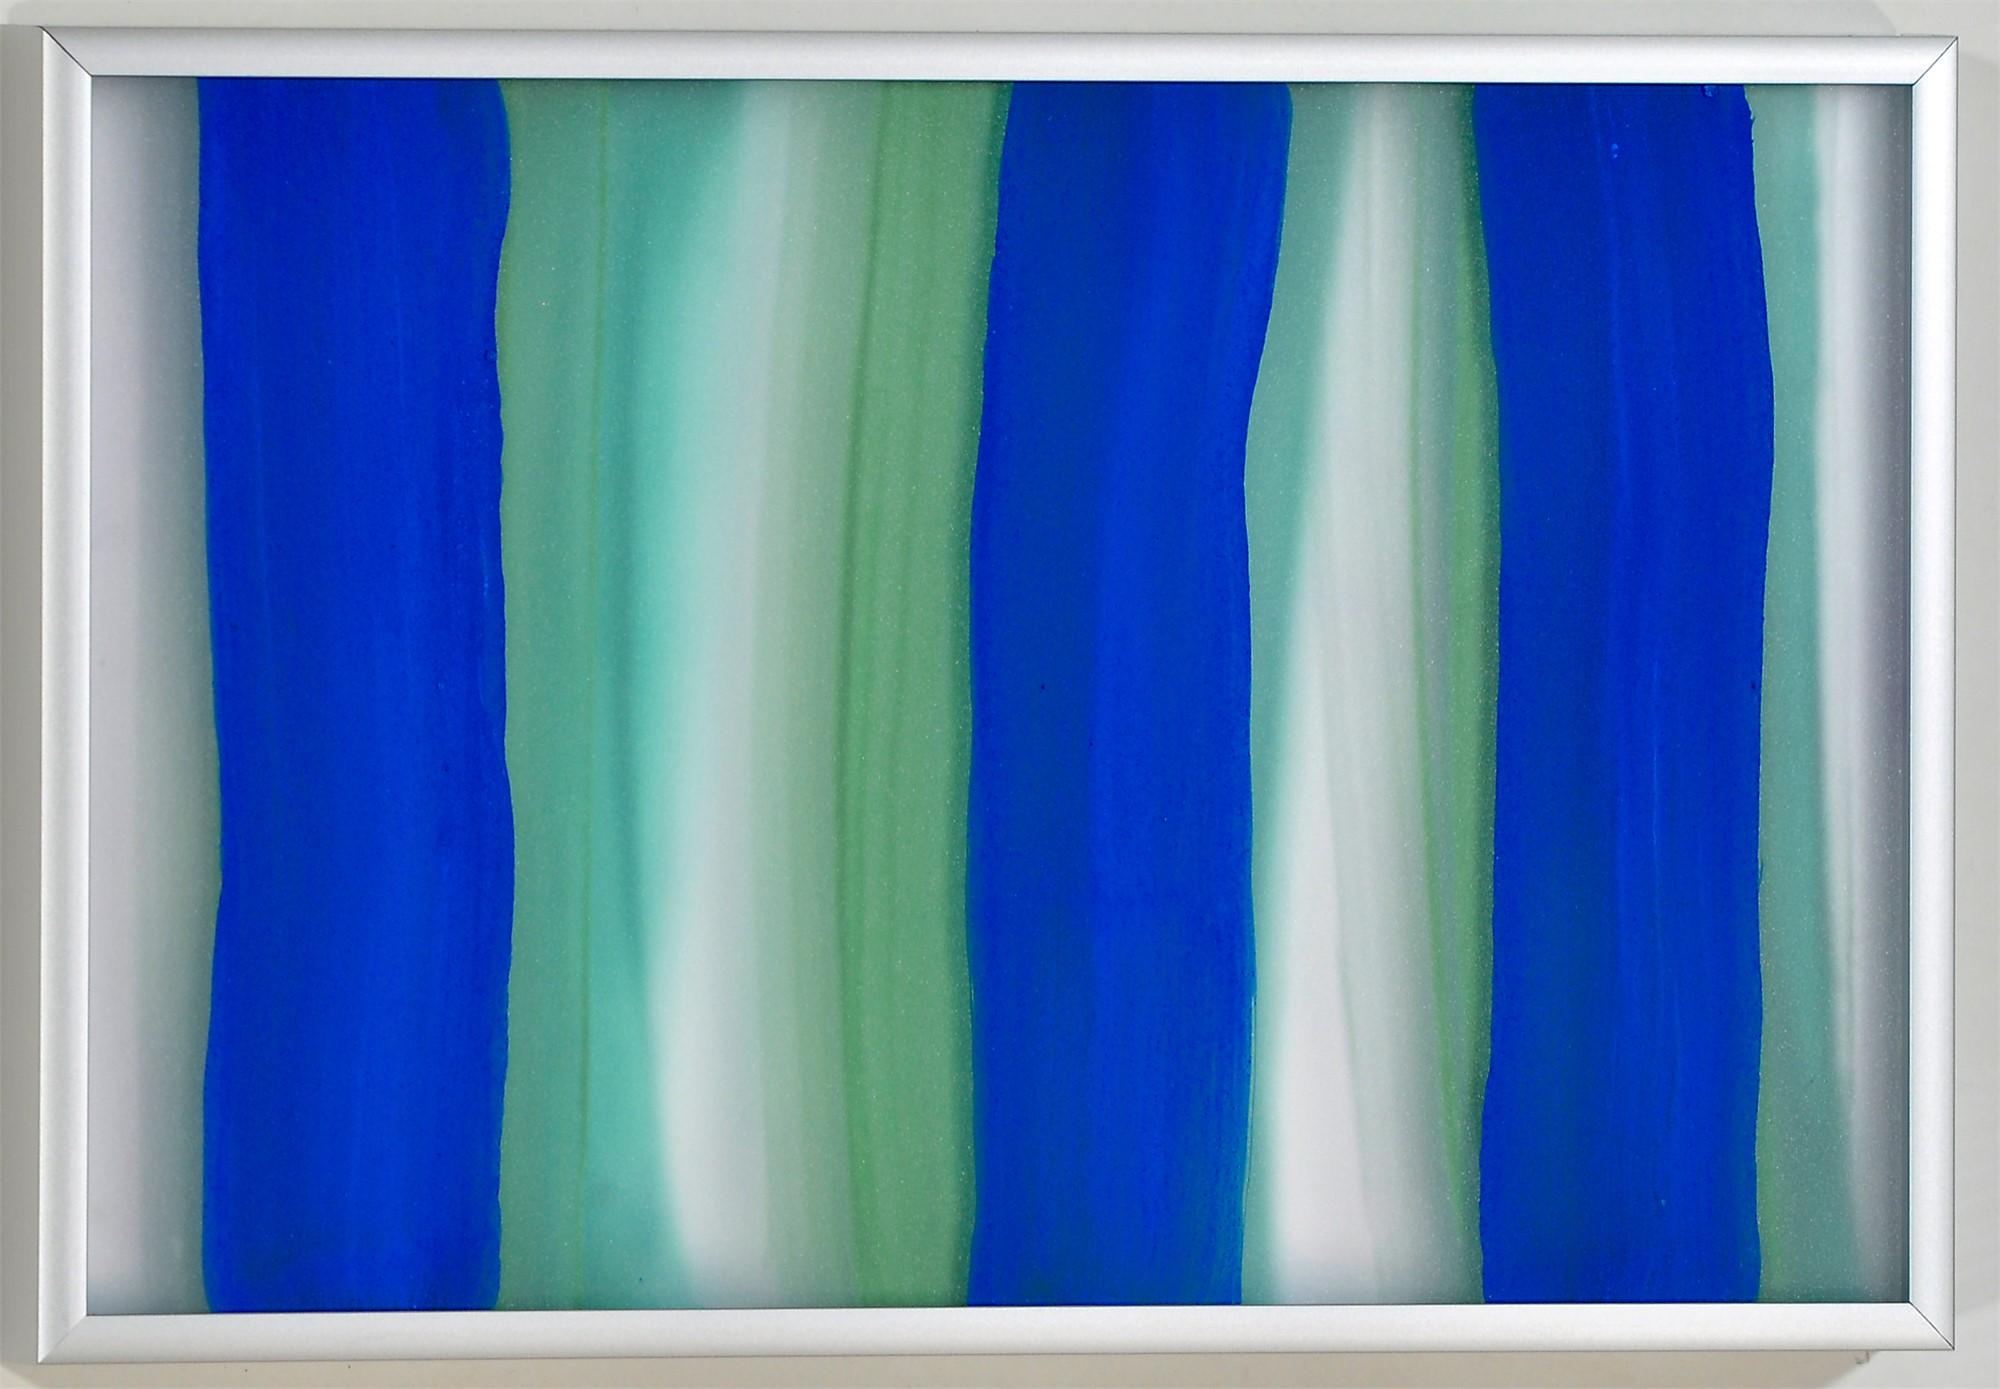 Sensing Lines 6 by Lucinda Cobley